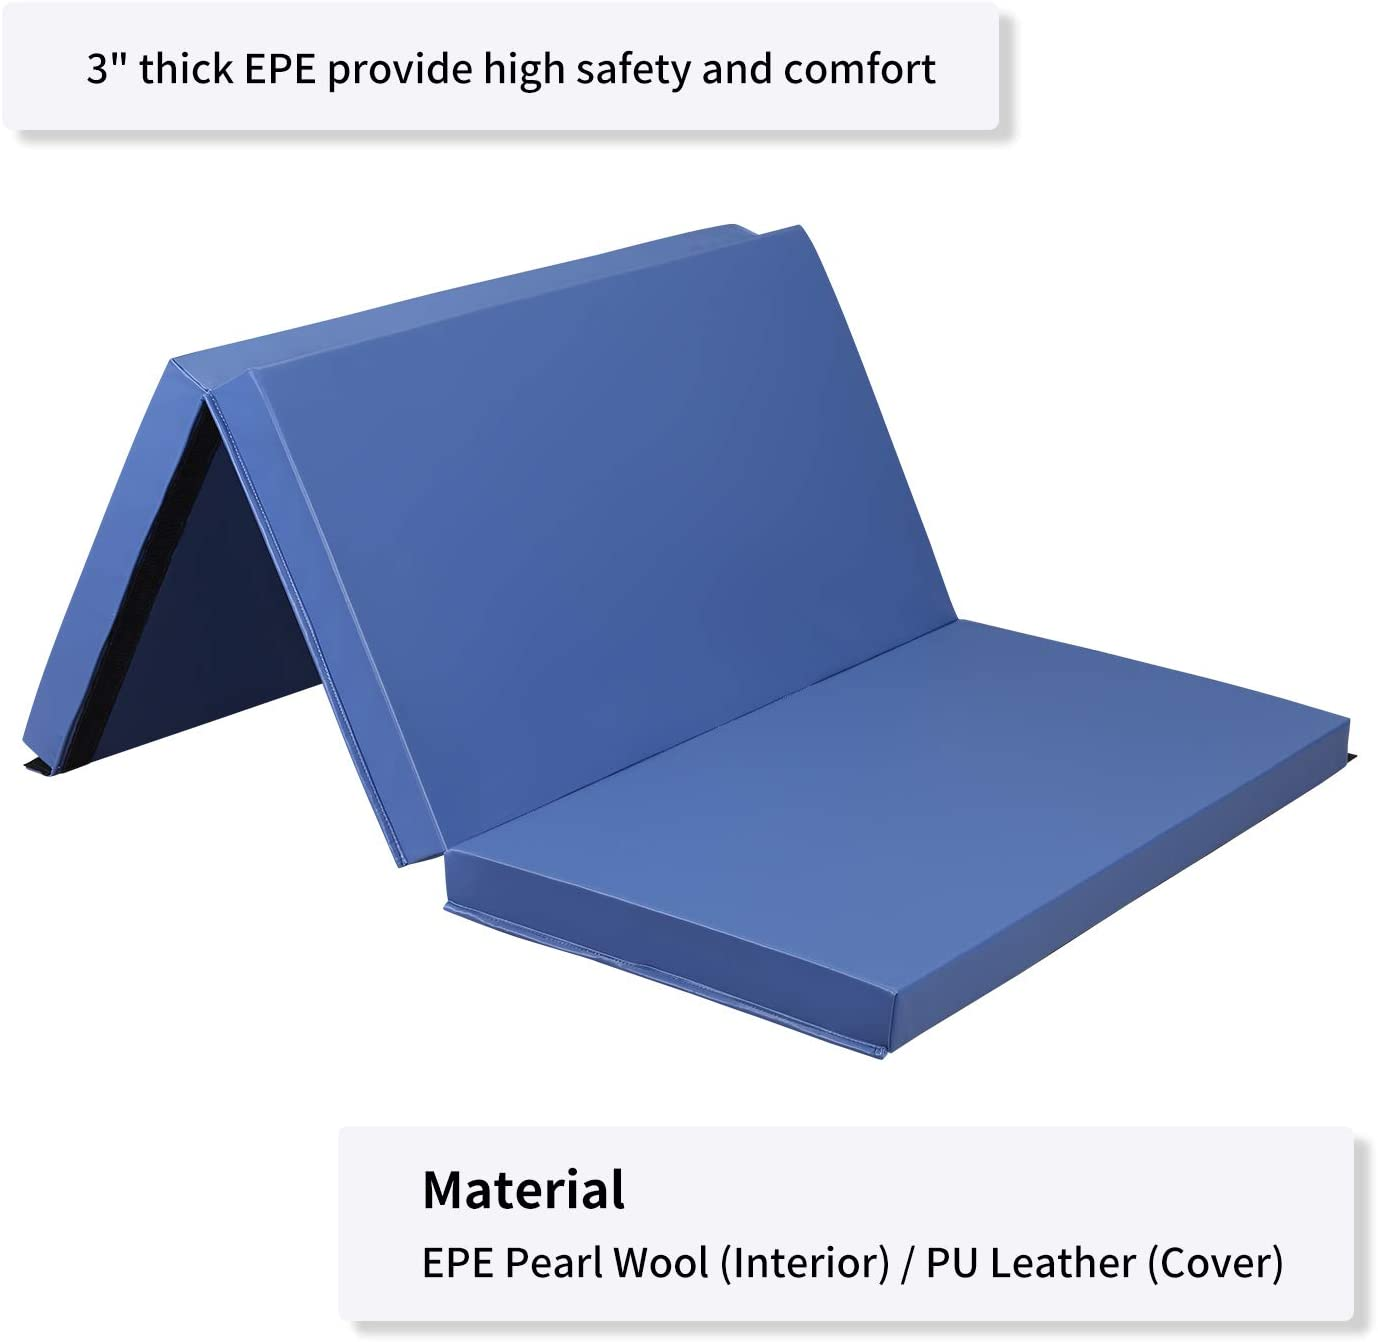 LEISURELIFE Adjustable Height Kip Bar /&4x10 Mat Packages-Fitness Gymnastics Training Horizontal Bar for Kids Boys and Girls